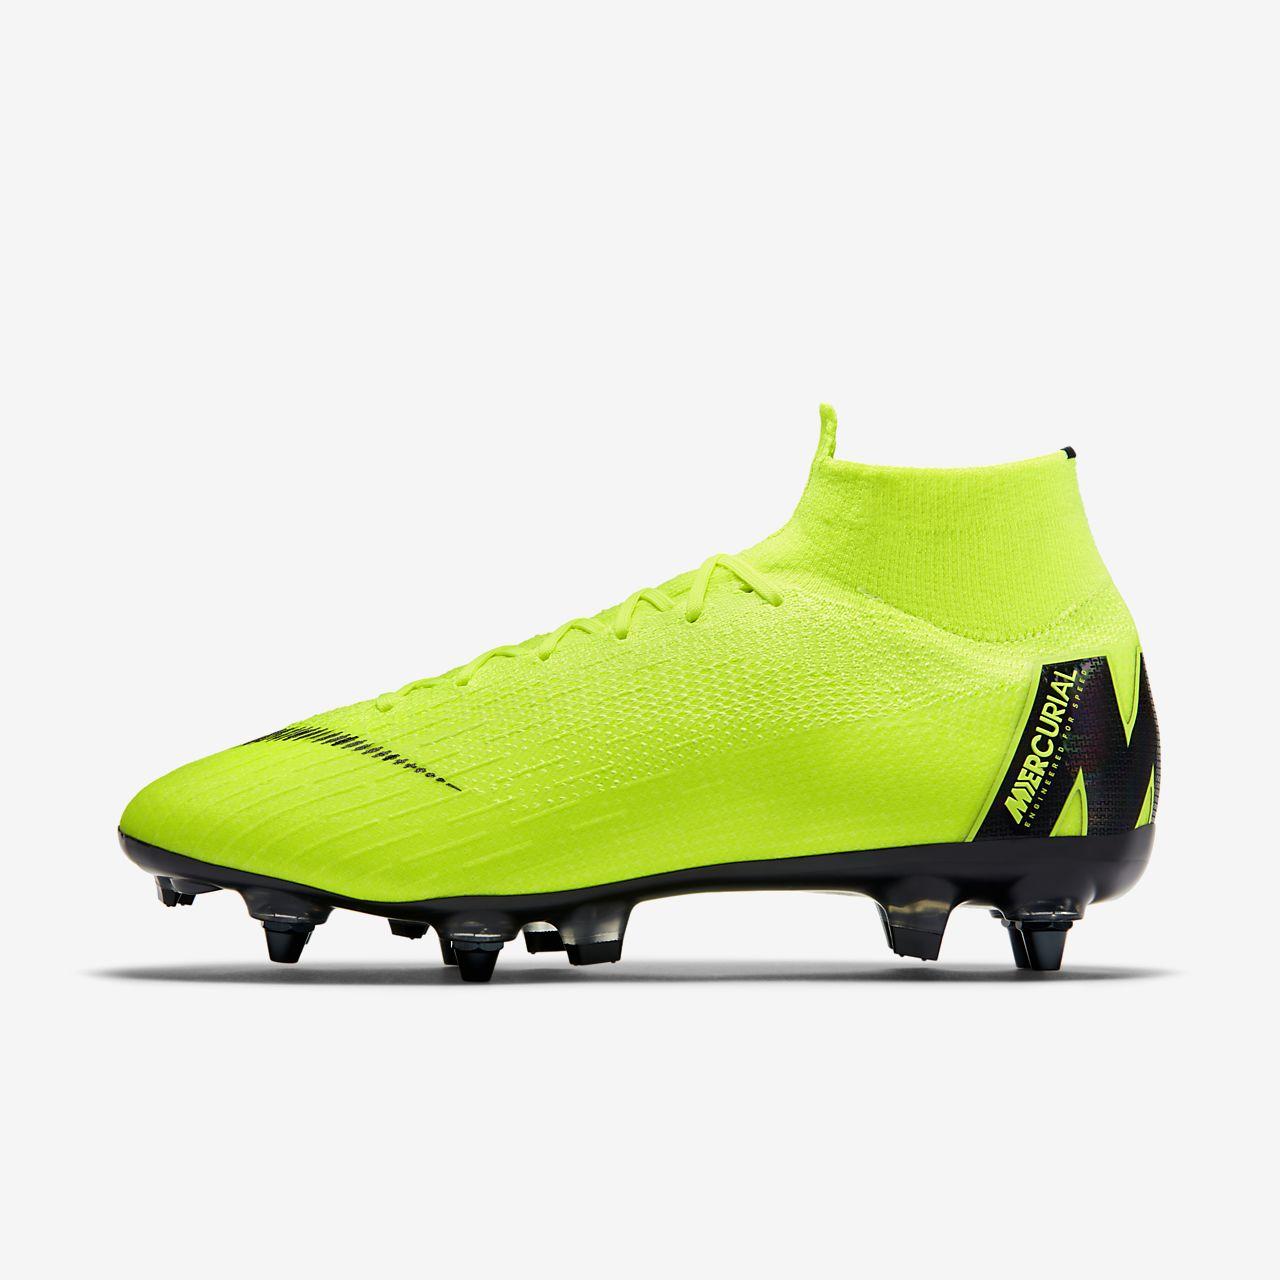 Bande Chaussure Football De Nike Protection xrosdQBtCh